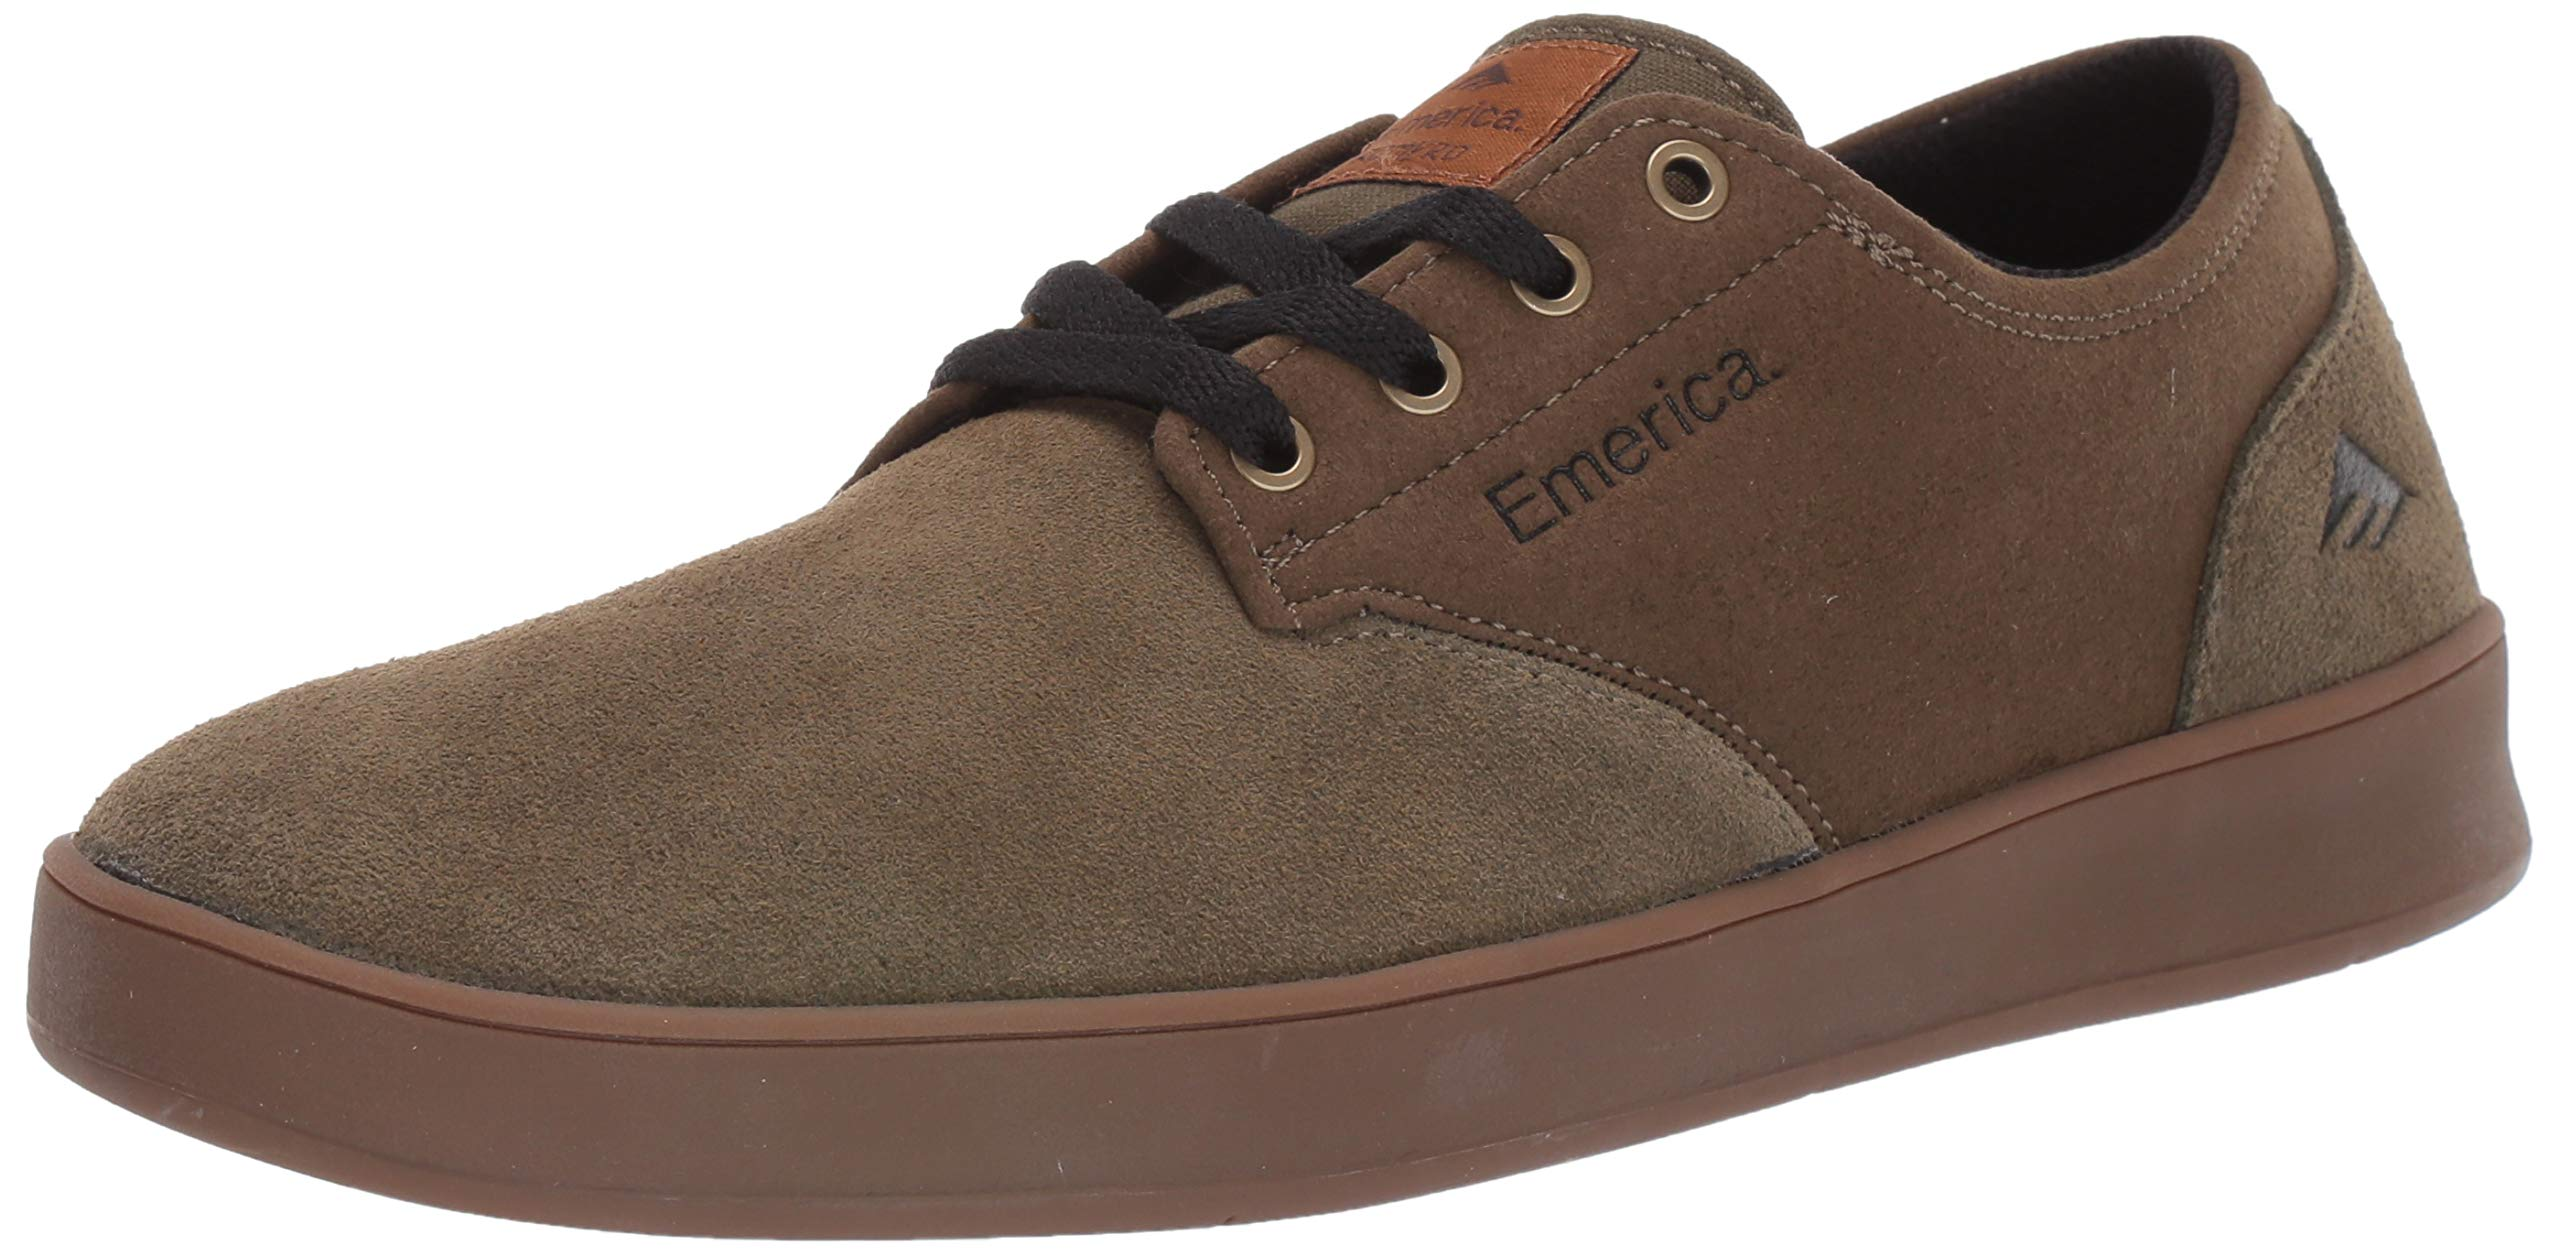 "Men/'s Skating Shoes Dark Grey//Black//Gum Emerica /""The Romero Laced/"" Sneakers"